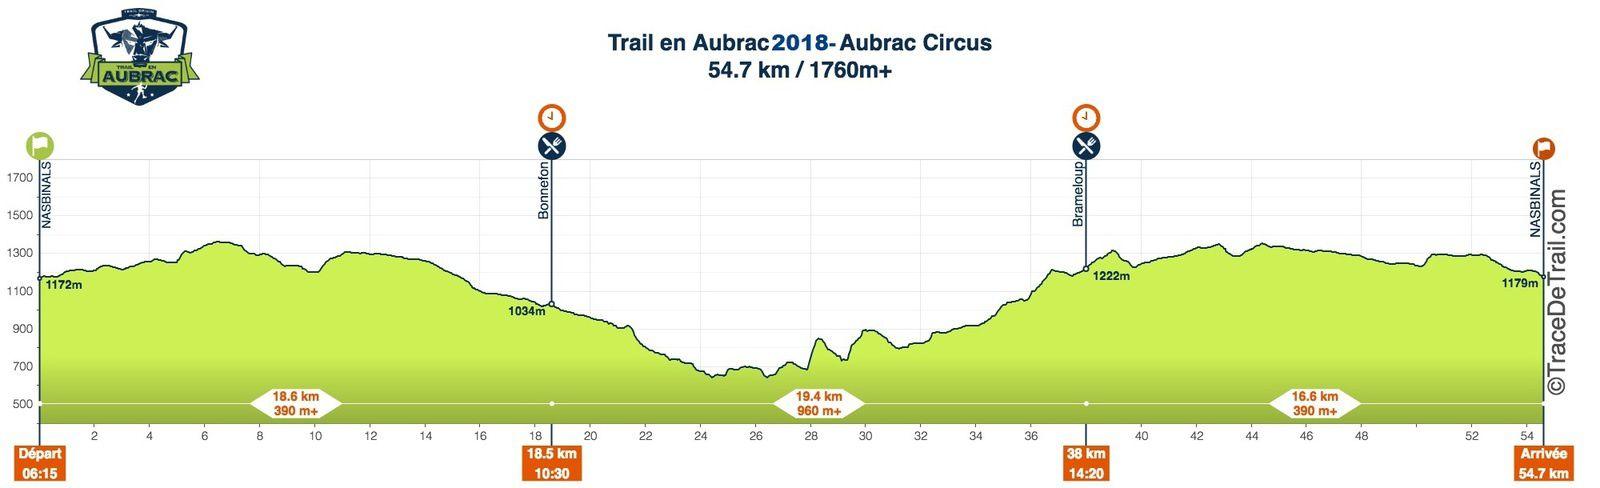 Trail en Aubrac : l'Aubrac Circus